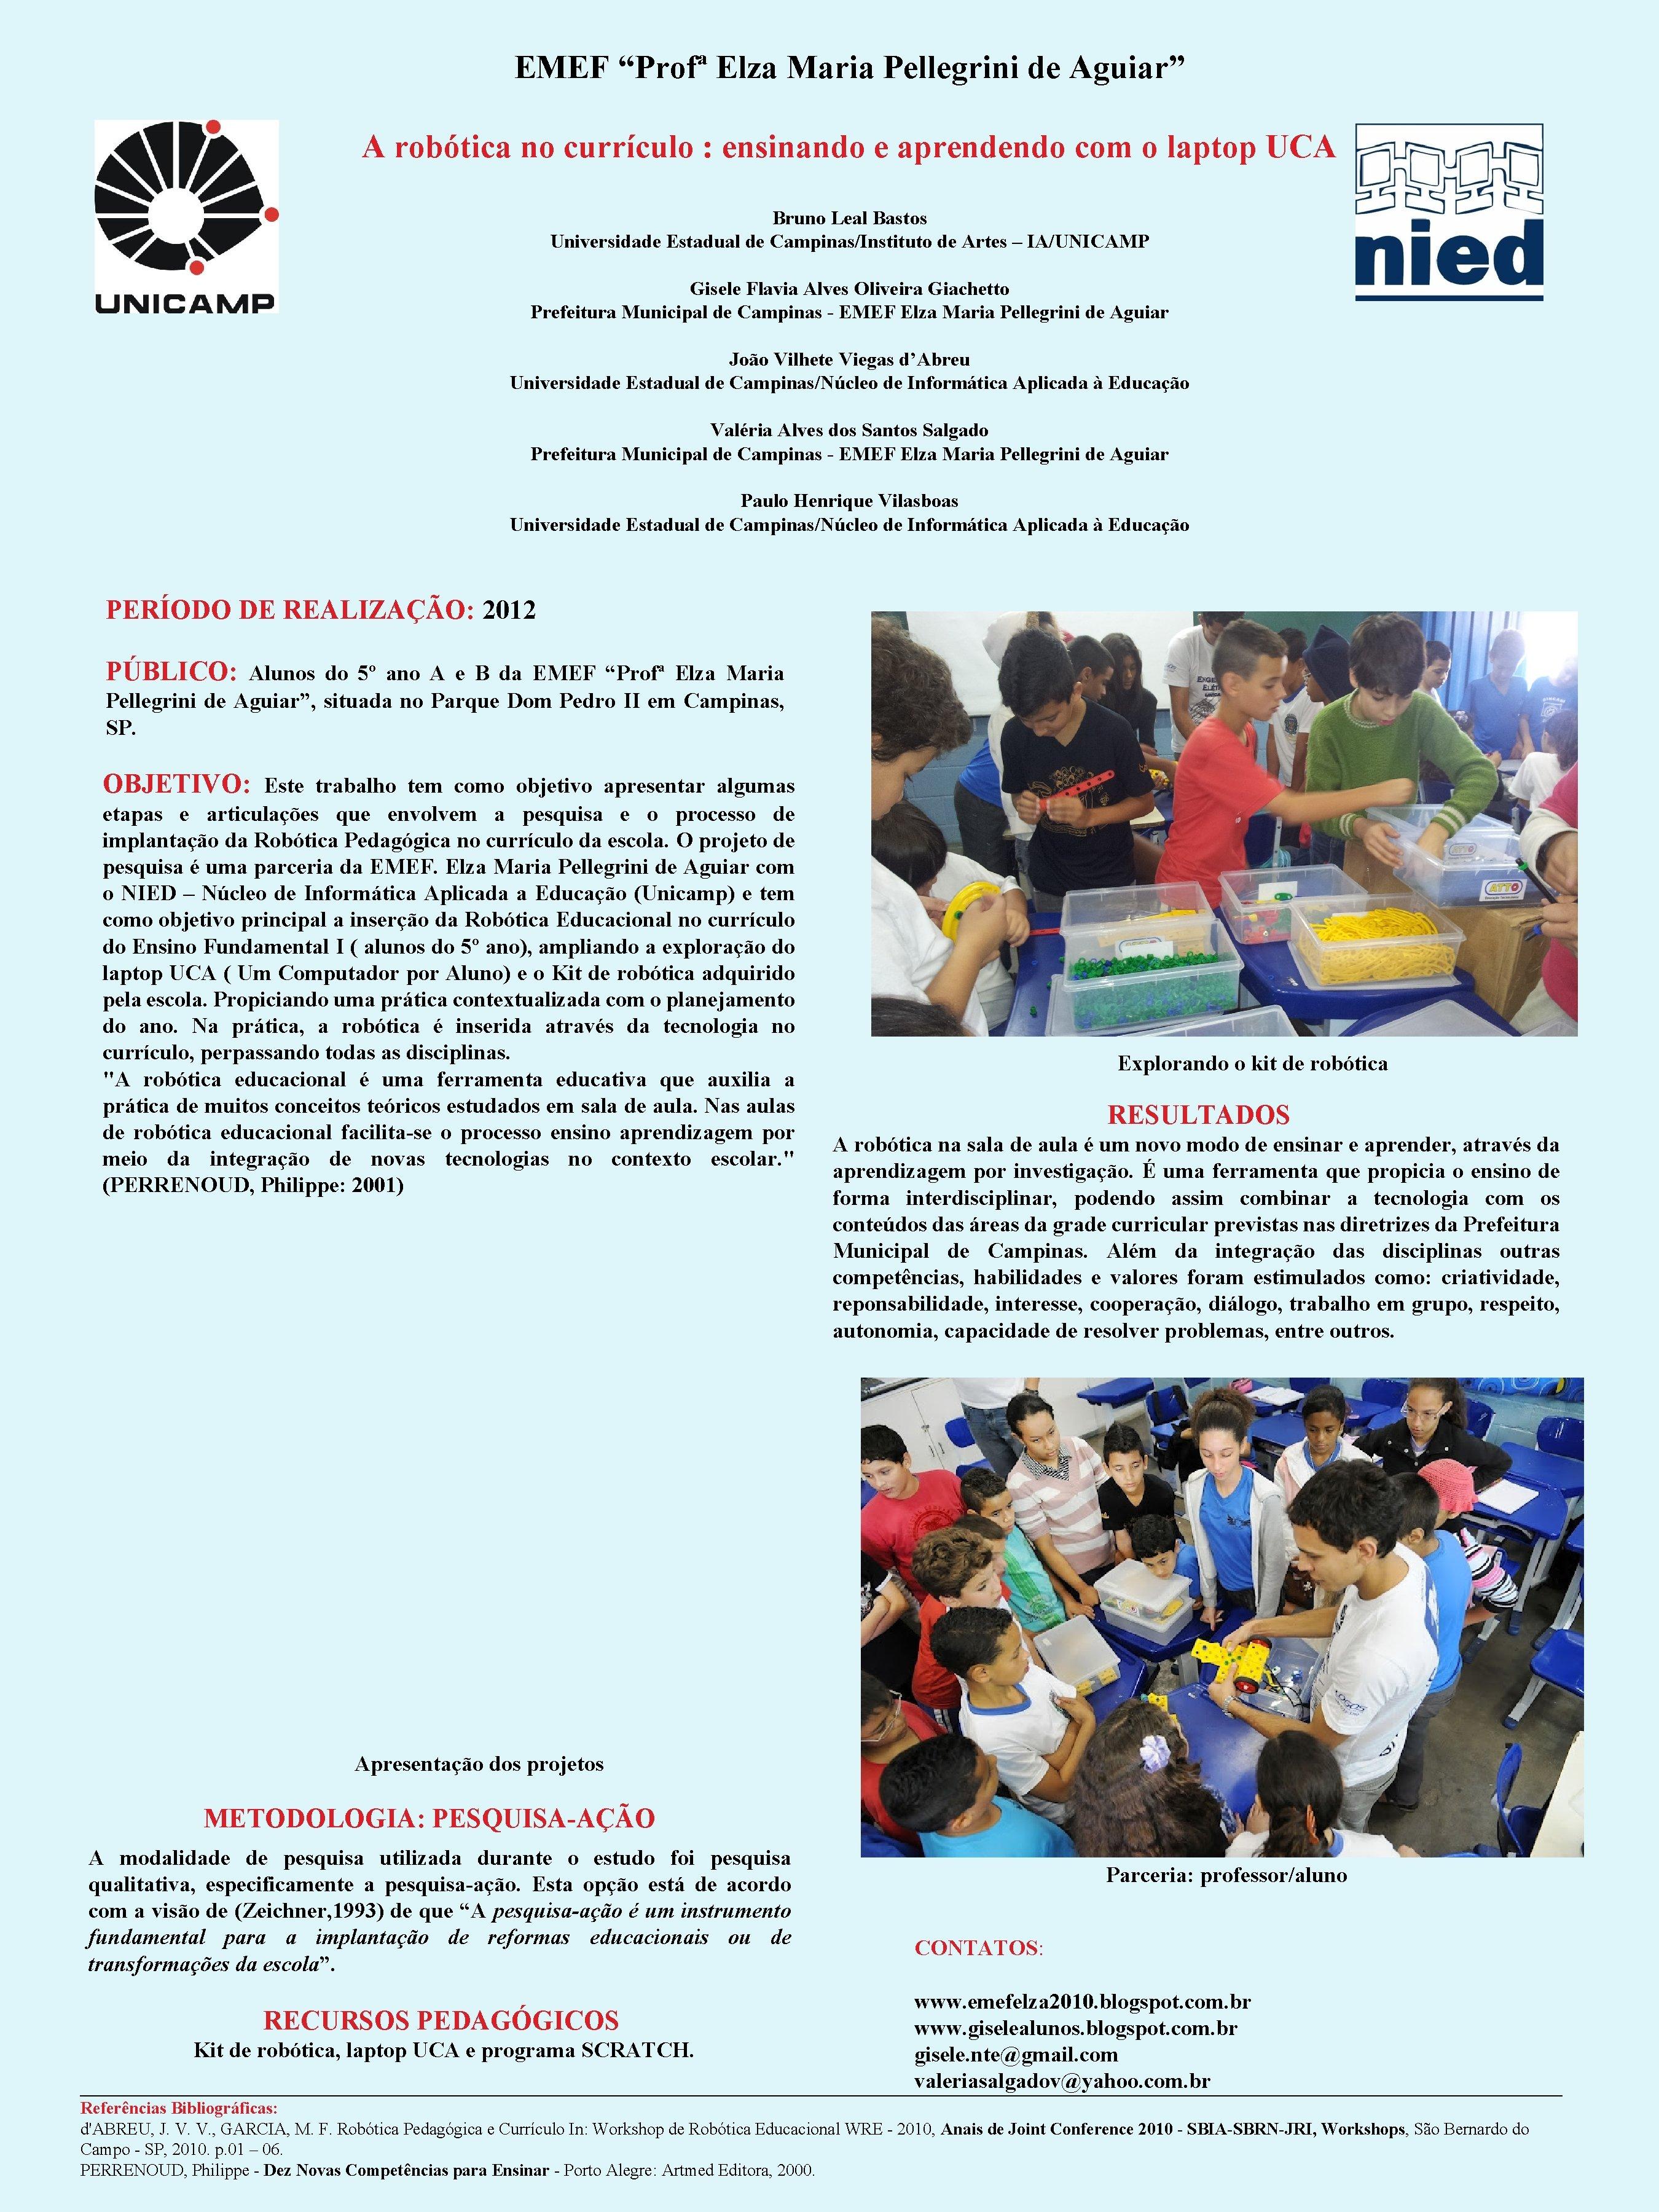 "EMEF ""Profª Elza Maria Pellegrini de Aguiar"" A robótica no currículo : ensinando e"